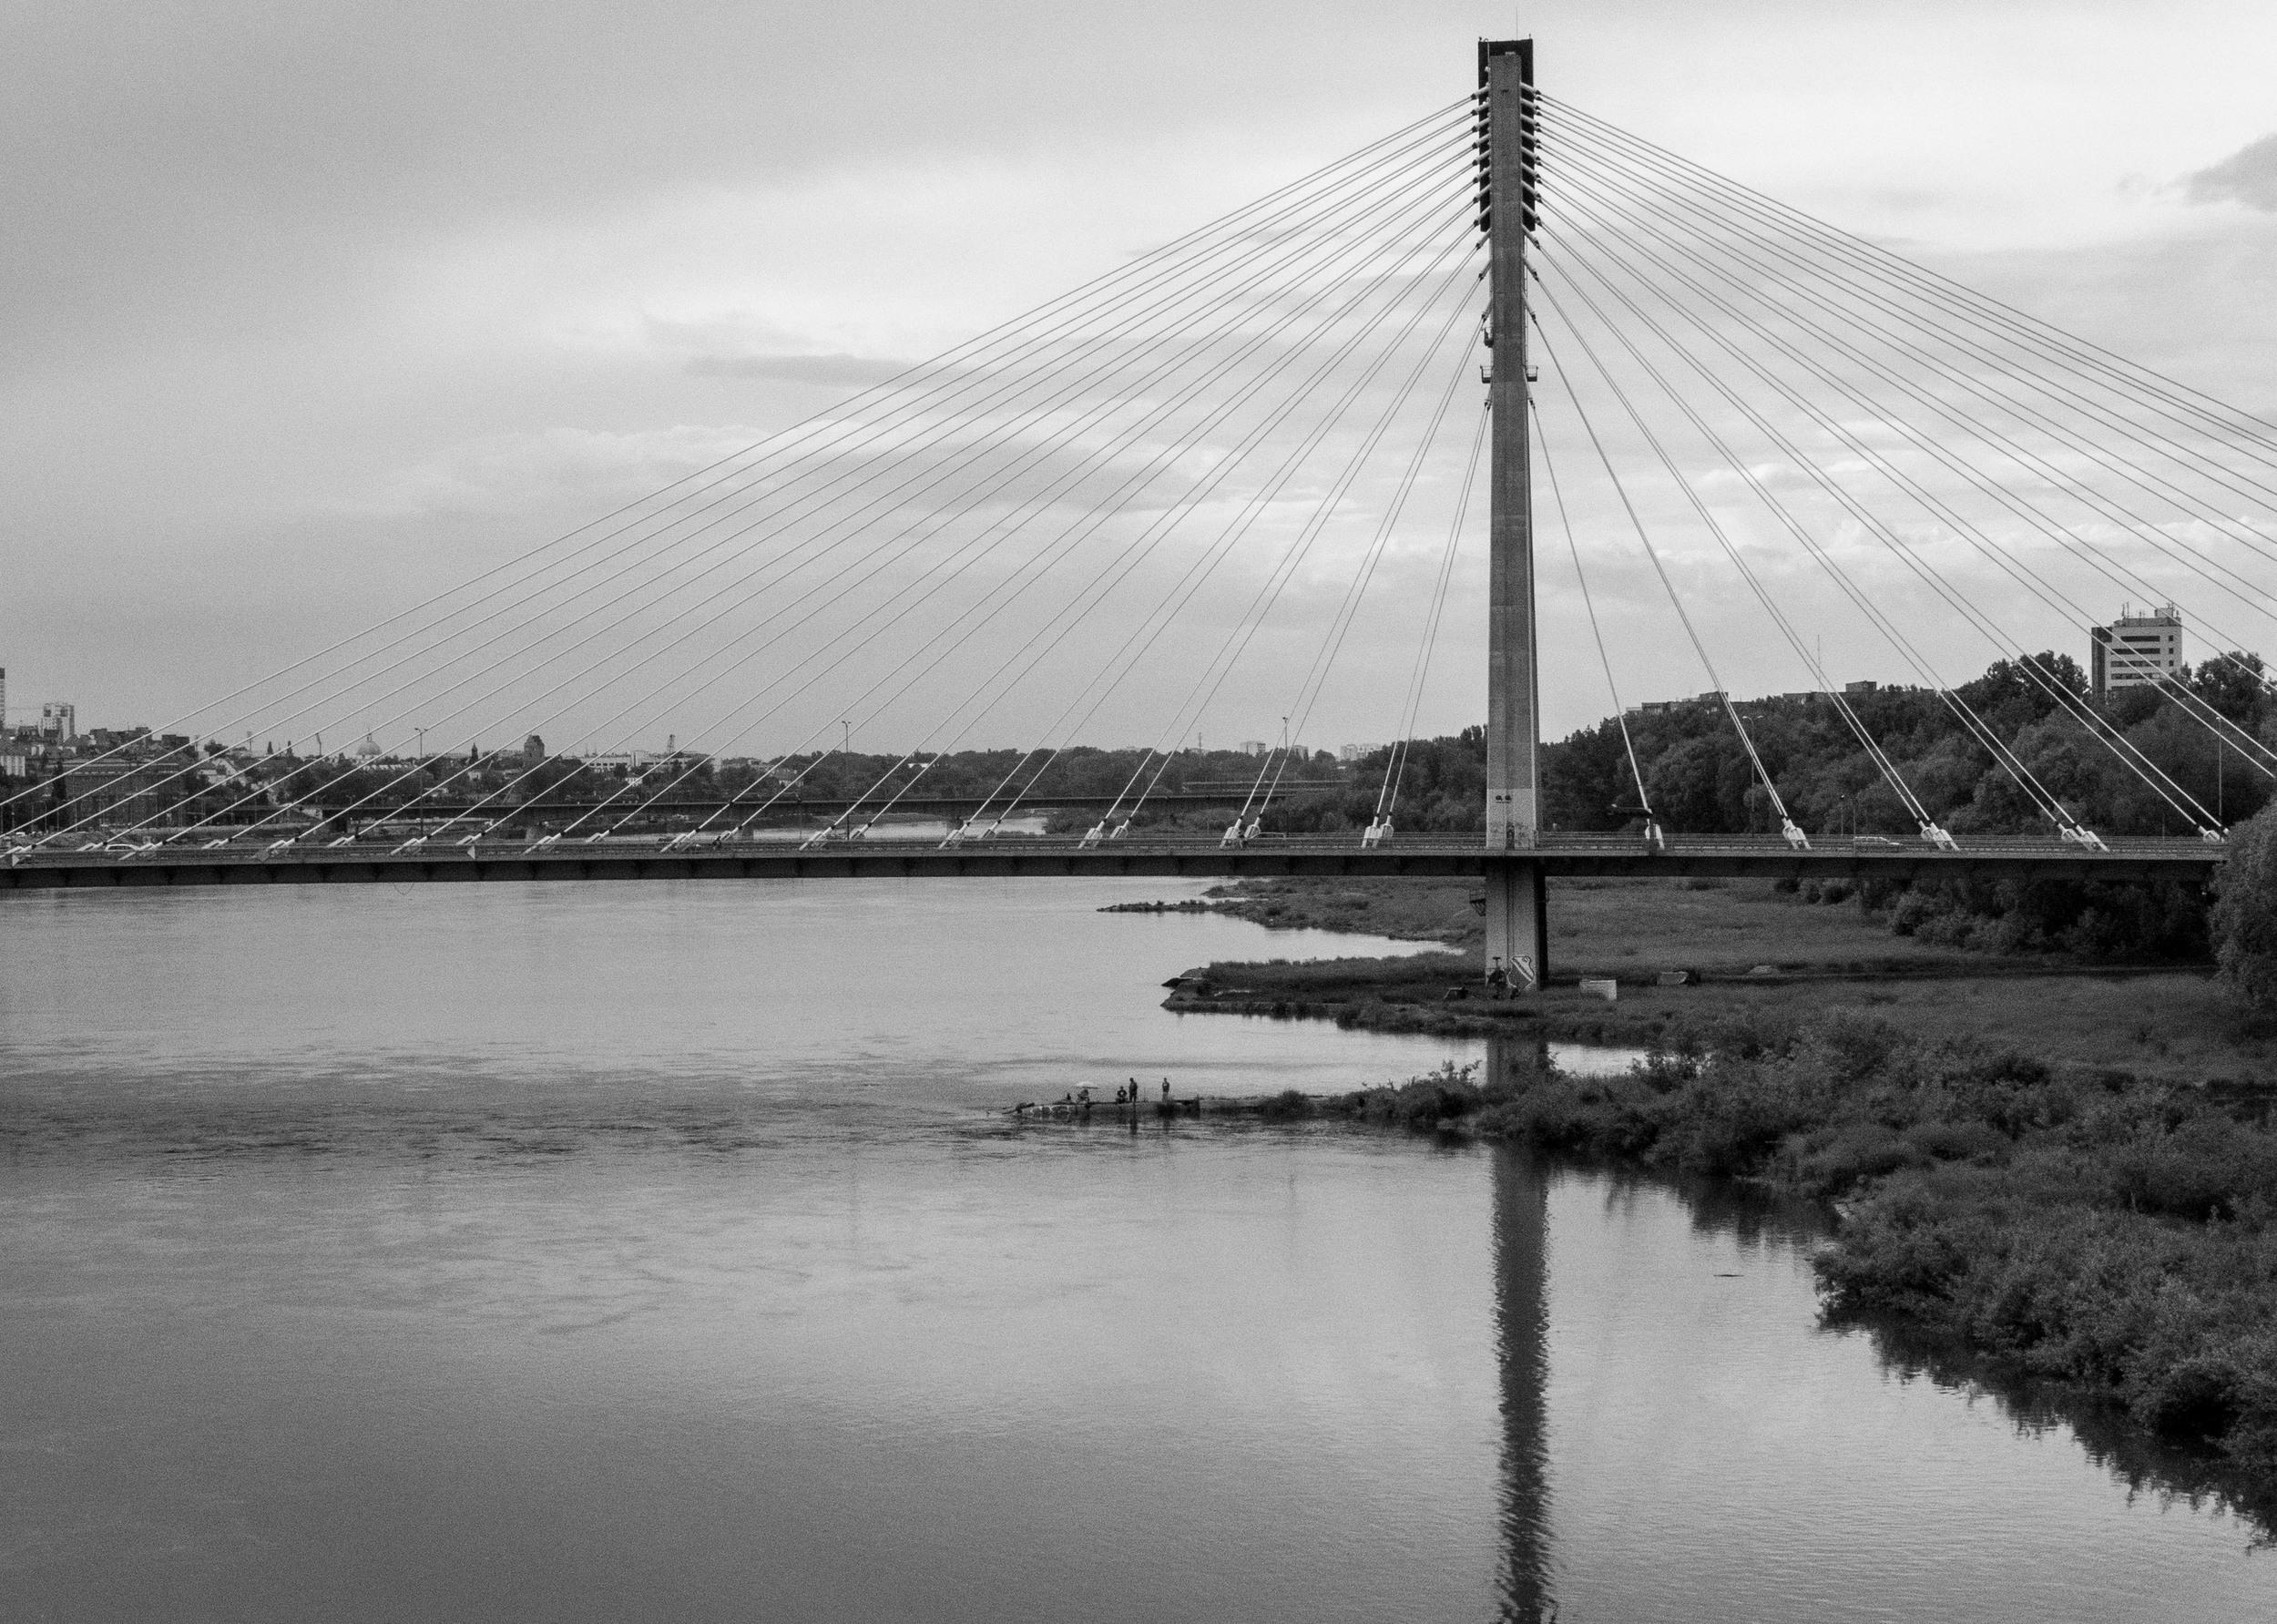 bridgecropped2.jpg